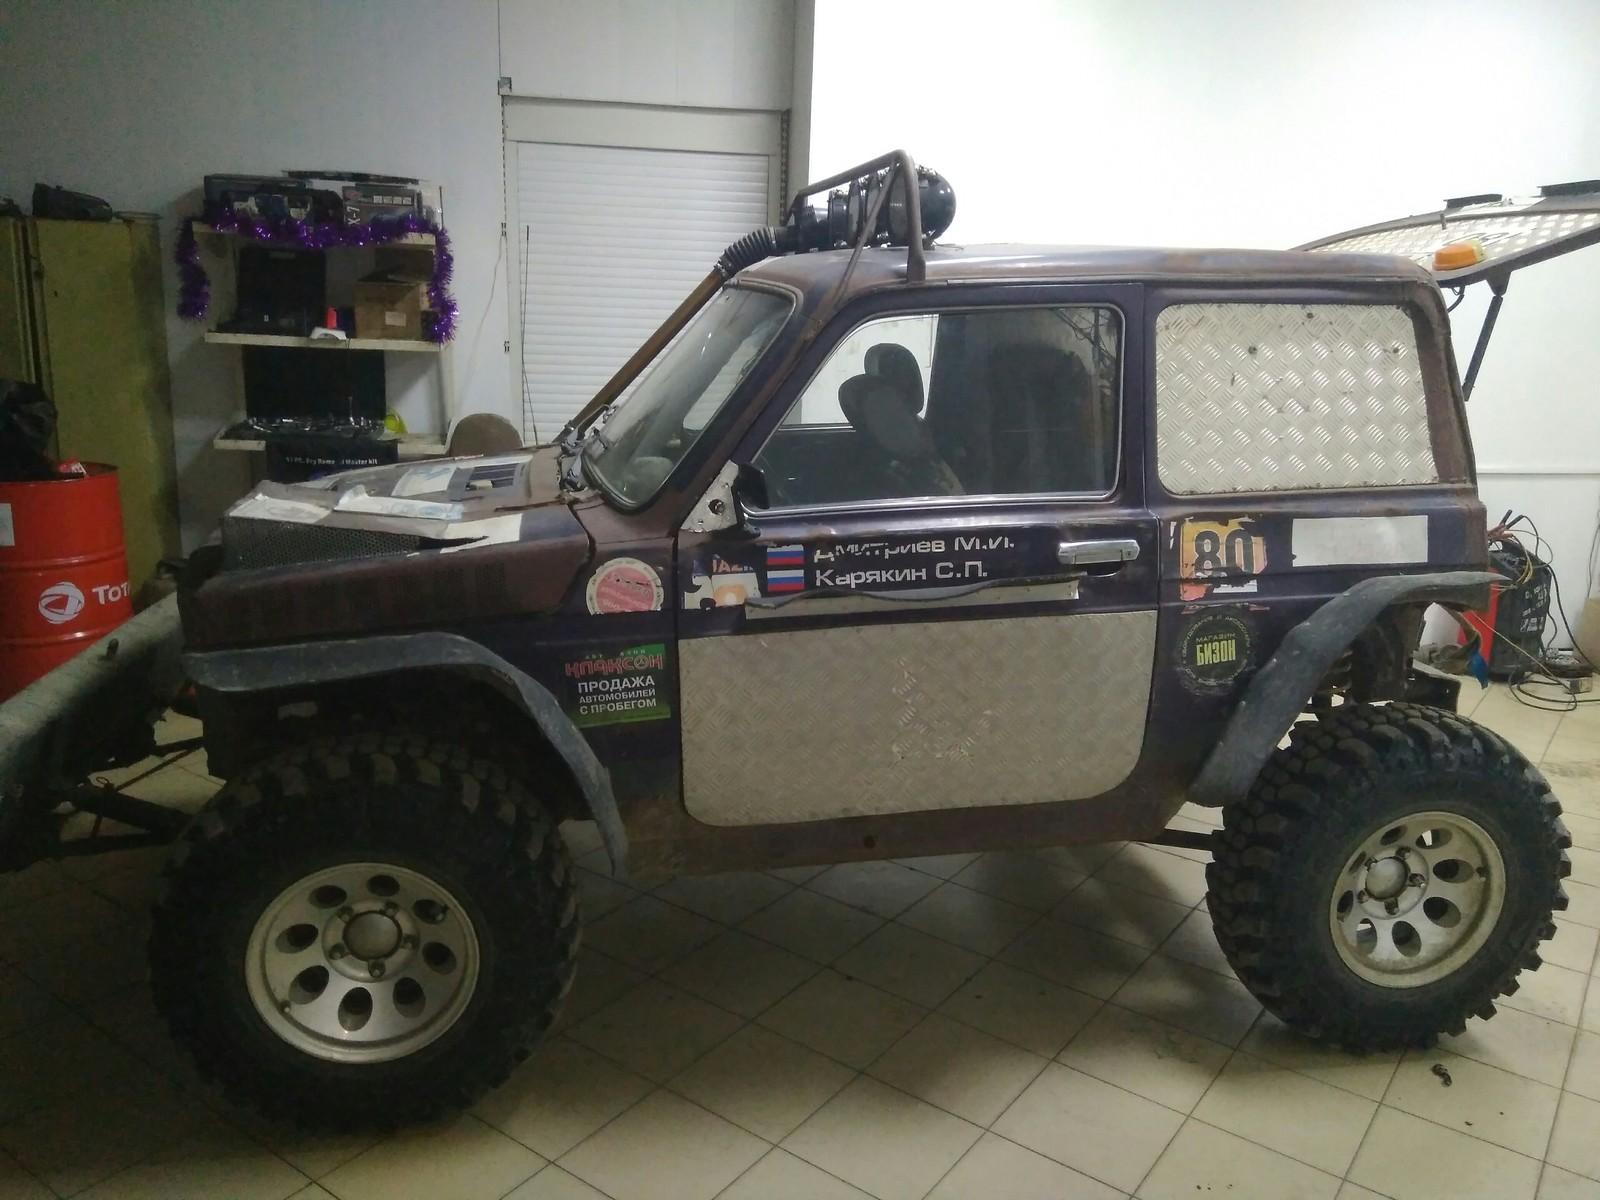 Обои джиппинг, багажник, джип, jeep, внедорожник. Автомобили foto 18